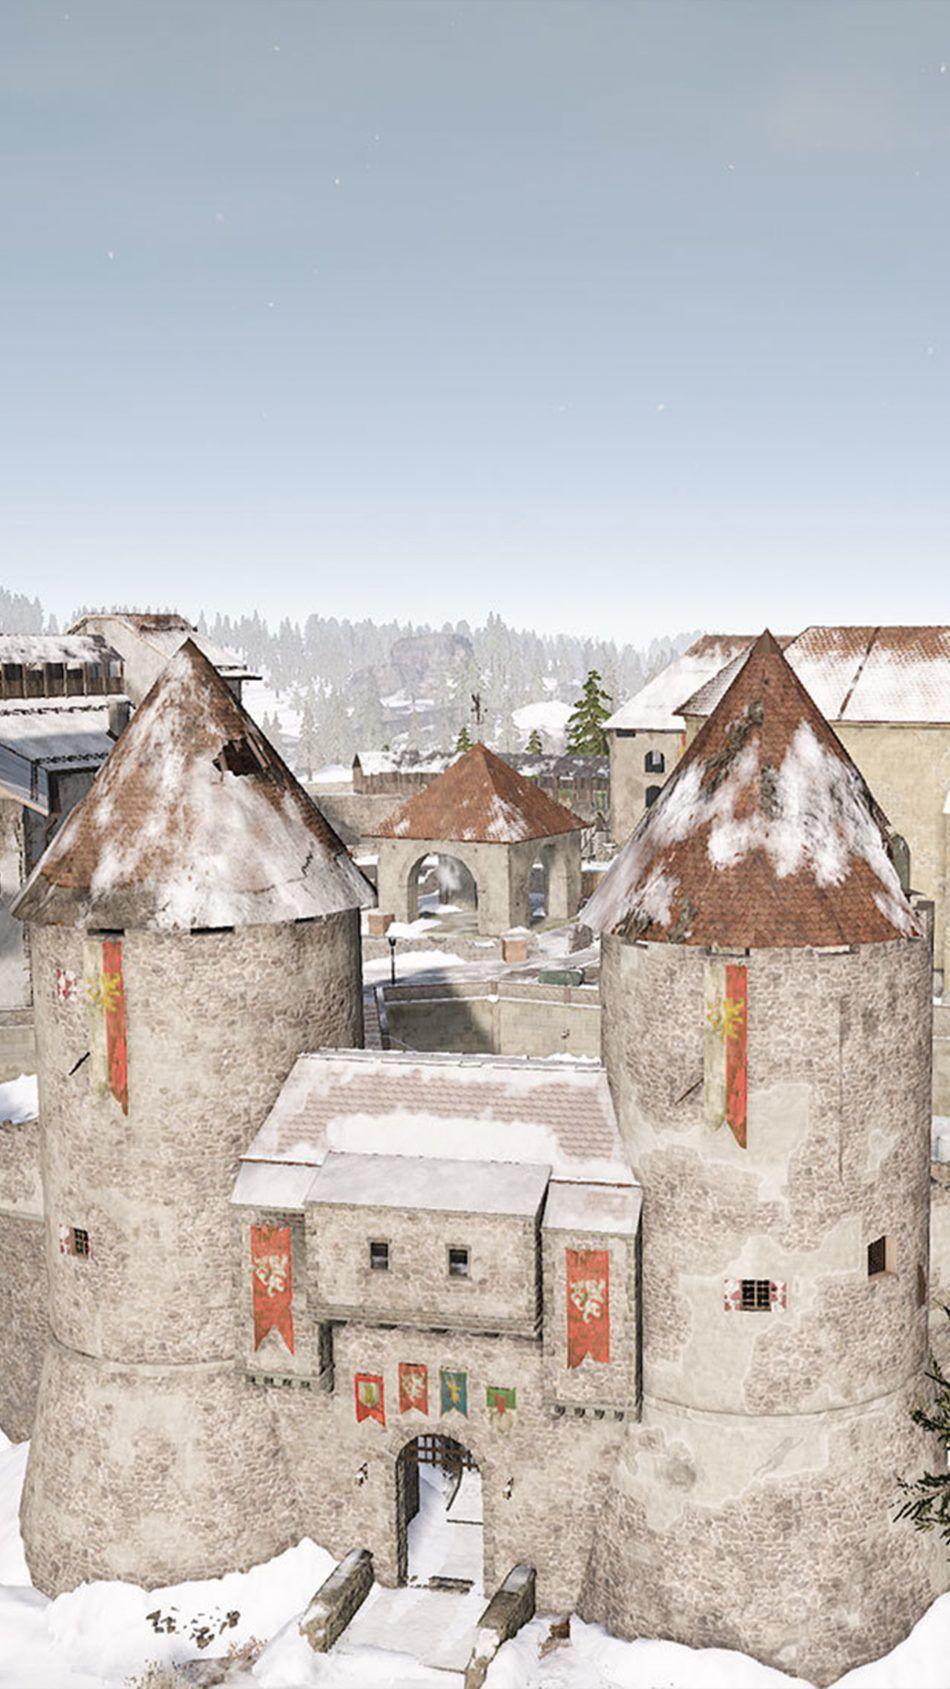 Pubg Castle Vikendi Playerunknown S Battlegrounds Playerunknown S